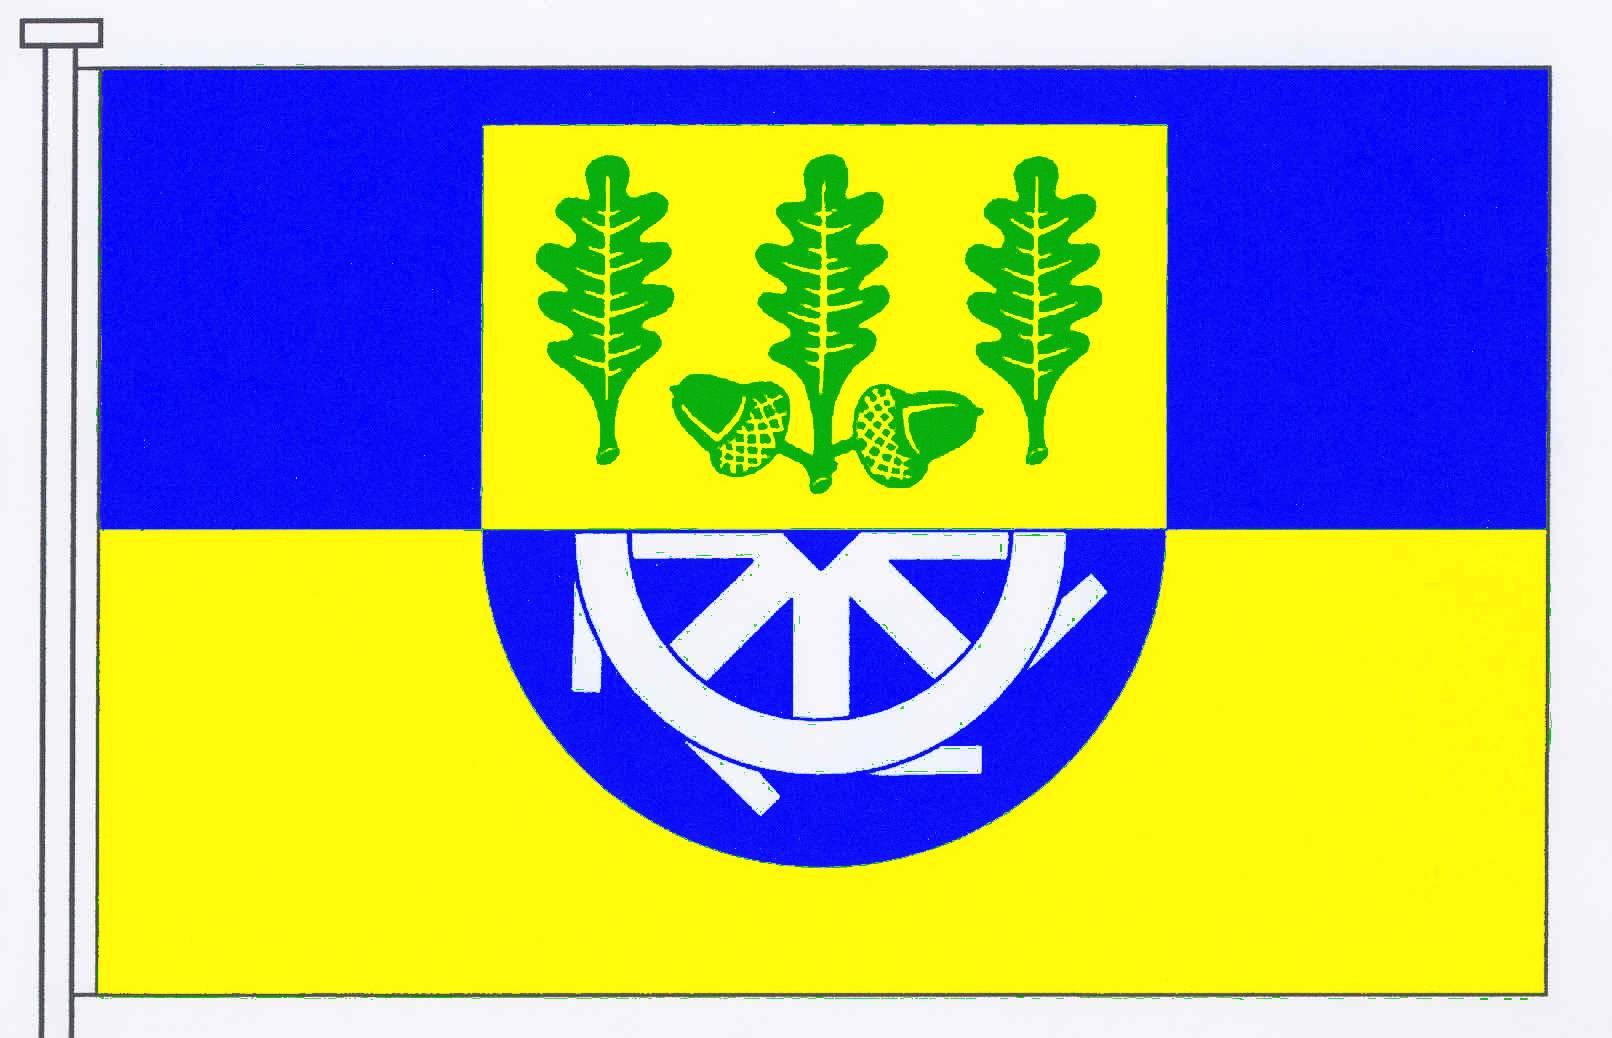 Flagge GemeindeBollingstedt, Kreis Schleswig-Flensburg